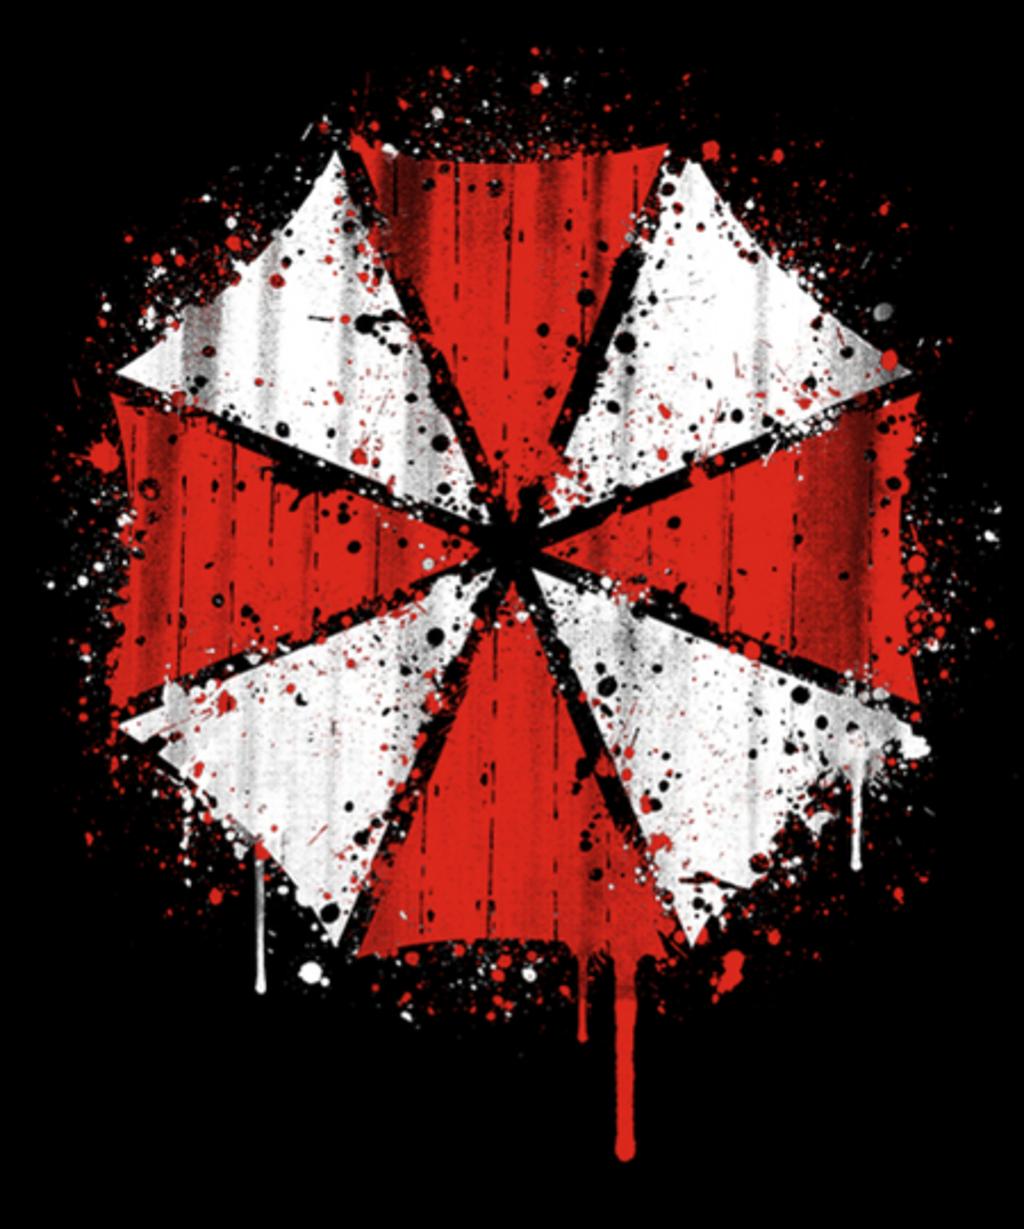 Qwertee: Evil Corp